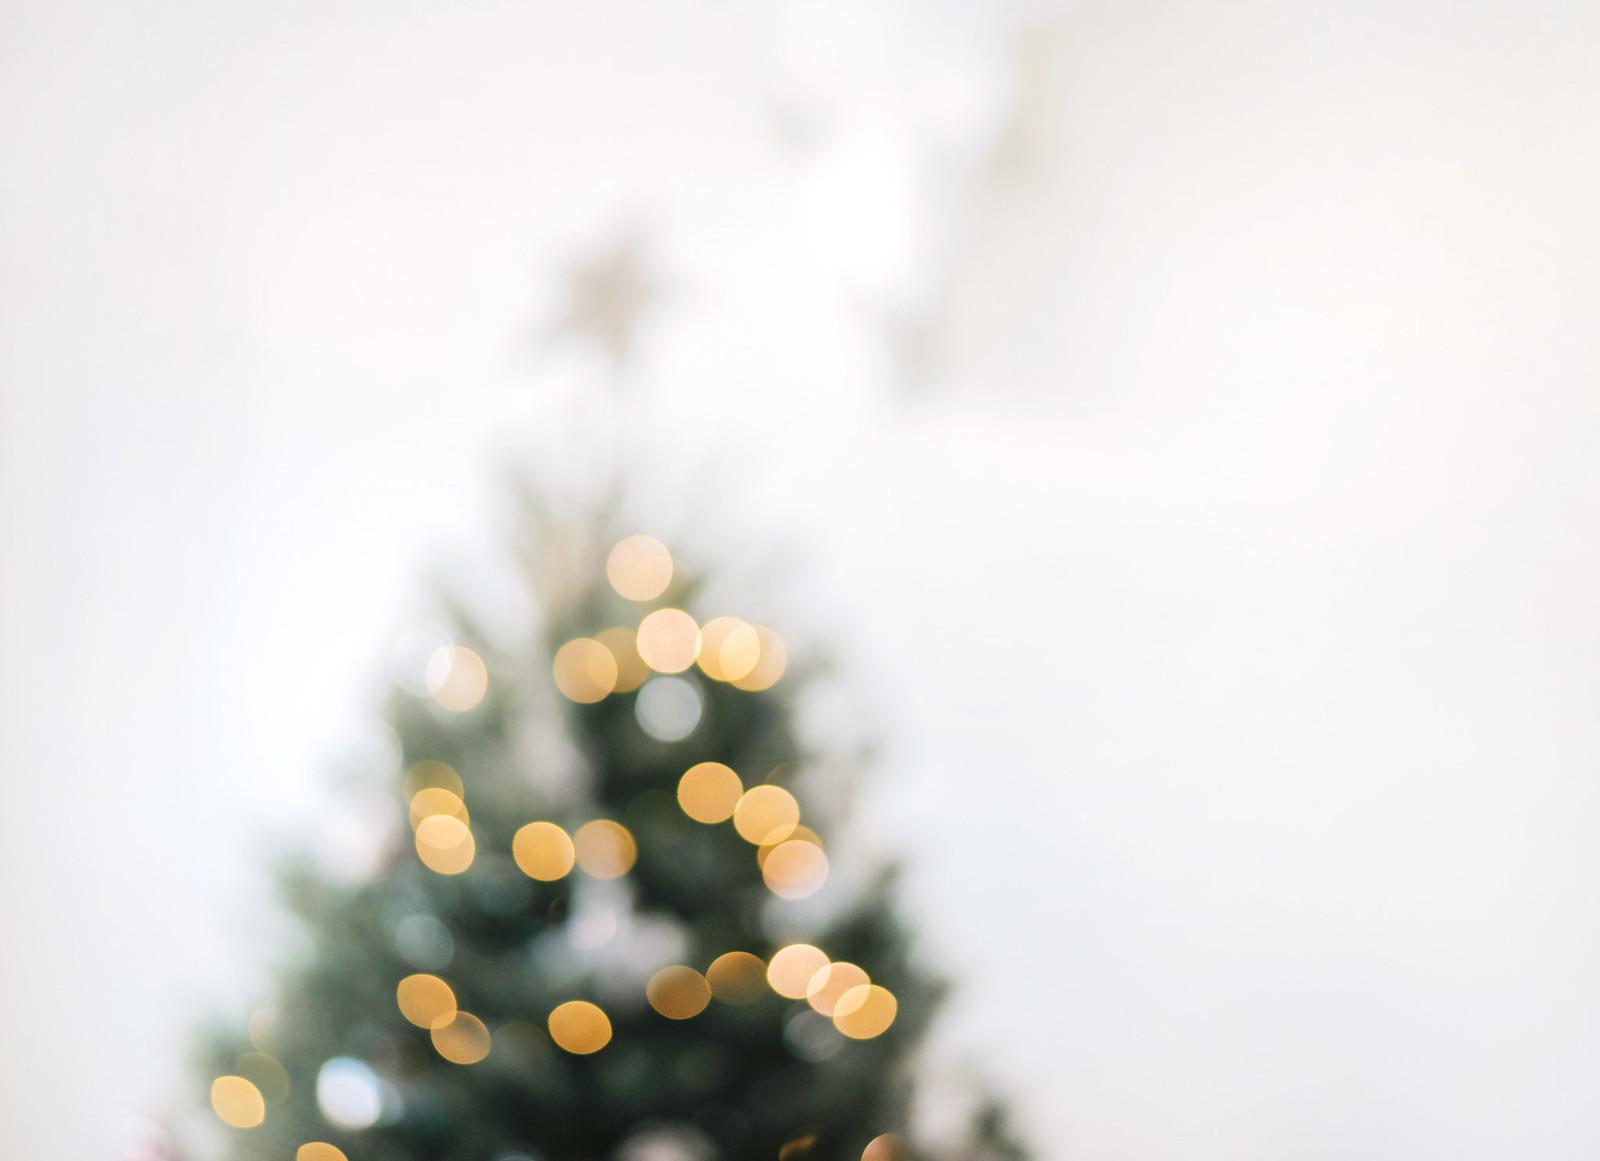 Christmas Tree Bokeh on juliettelaura.blogspot.com